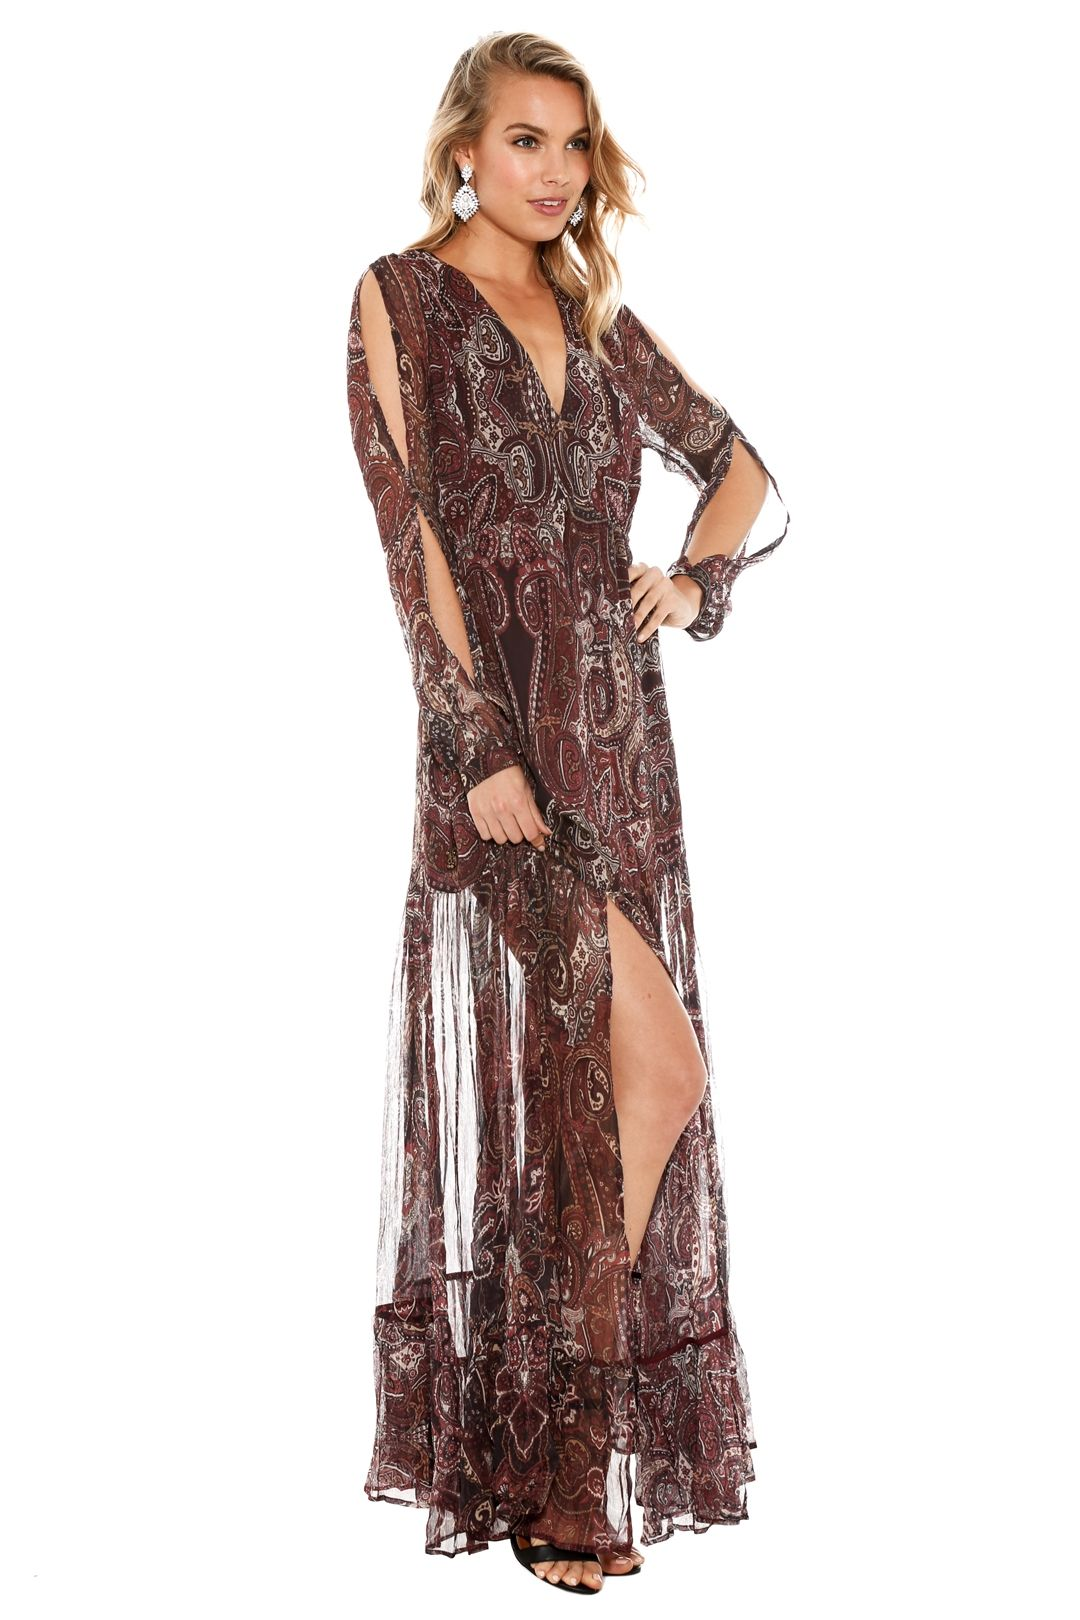 The Jetset Diaries - Labyrinth Paisley Maxi Dress - Burgundy - Side